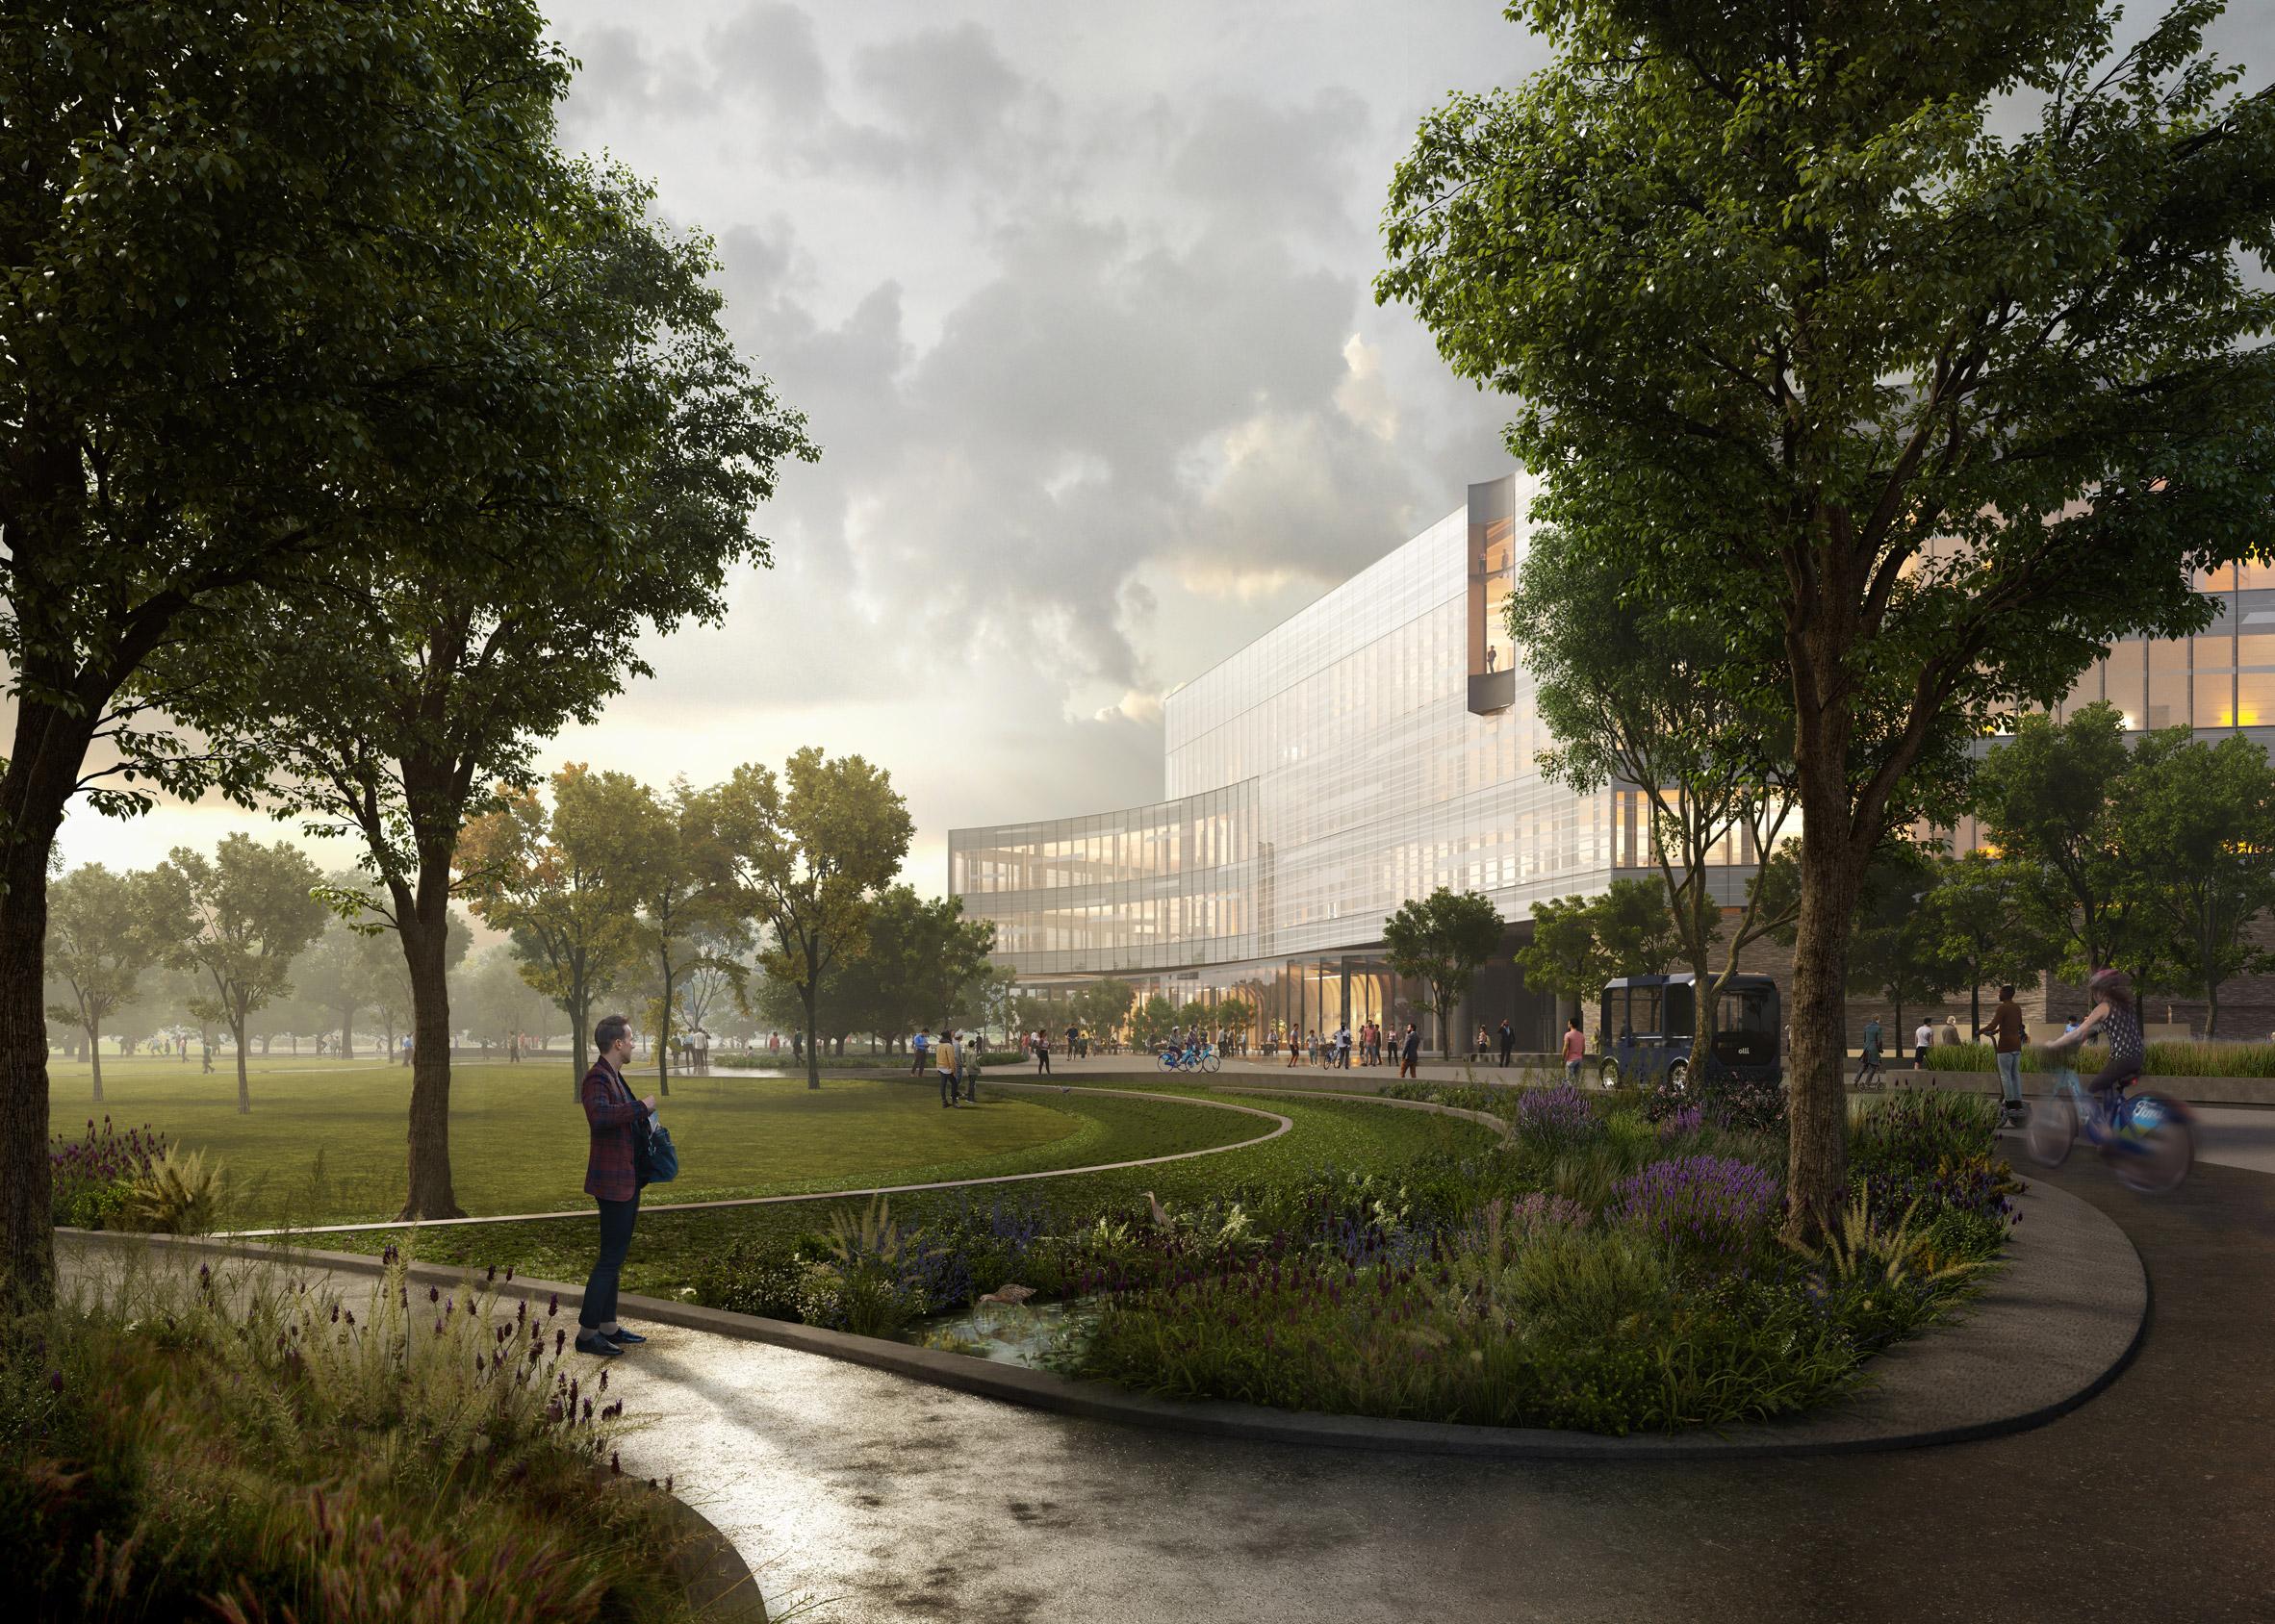 Architecture firm Snøhetta designed the project